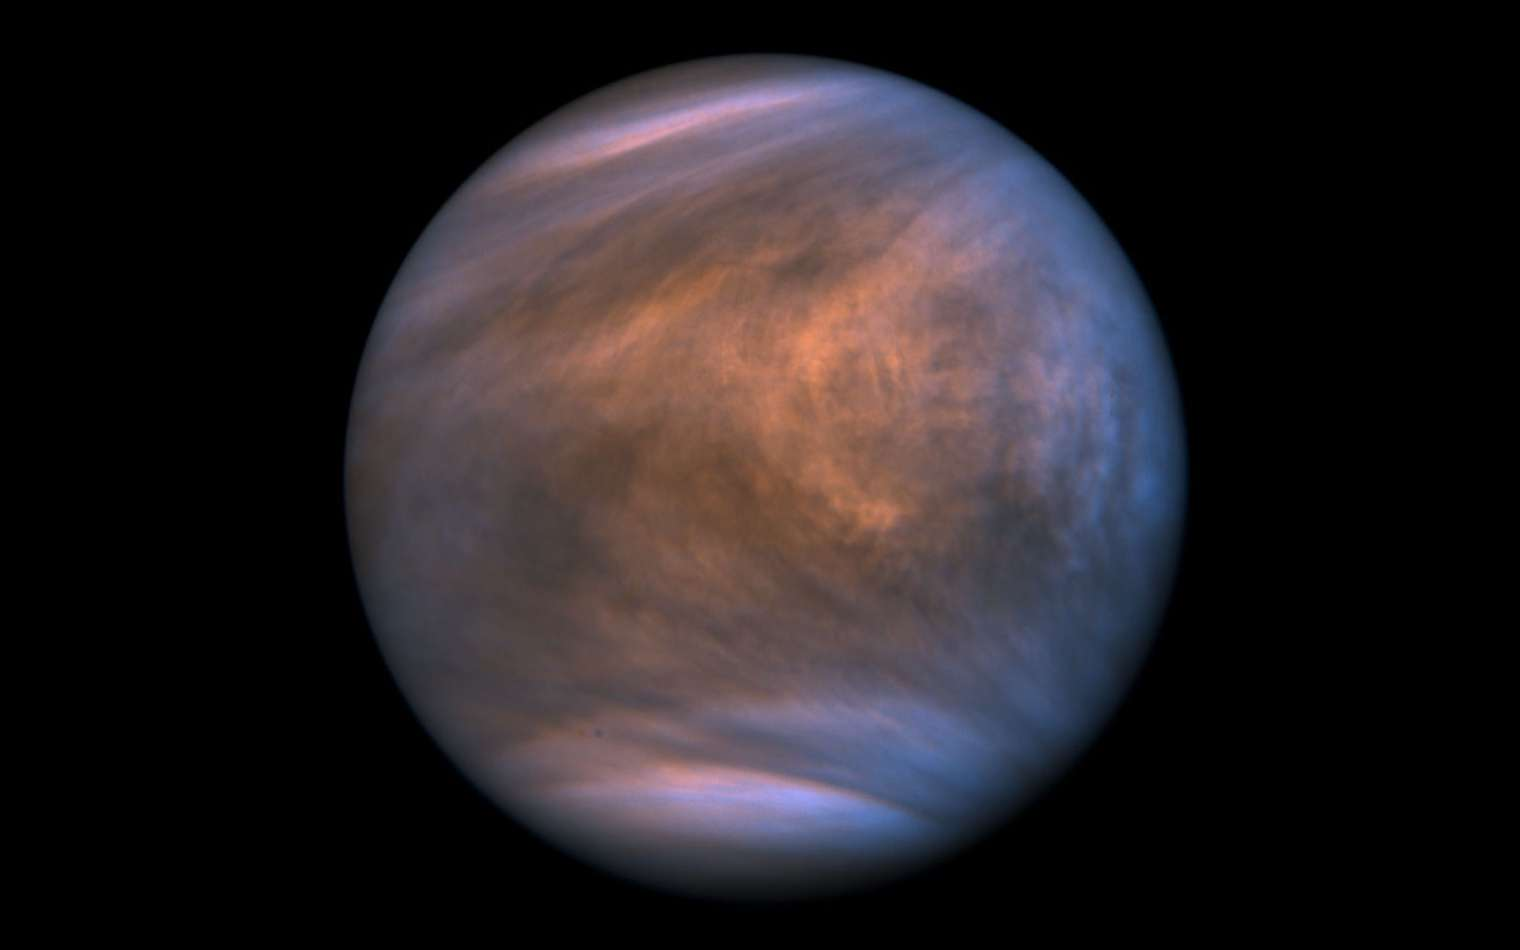 Notre voisine Vénus vue par la sonde japonaise Akatsuki. © Isas, Jaxa, Akatsuki, Meli thev.